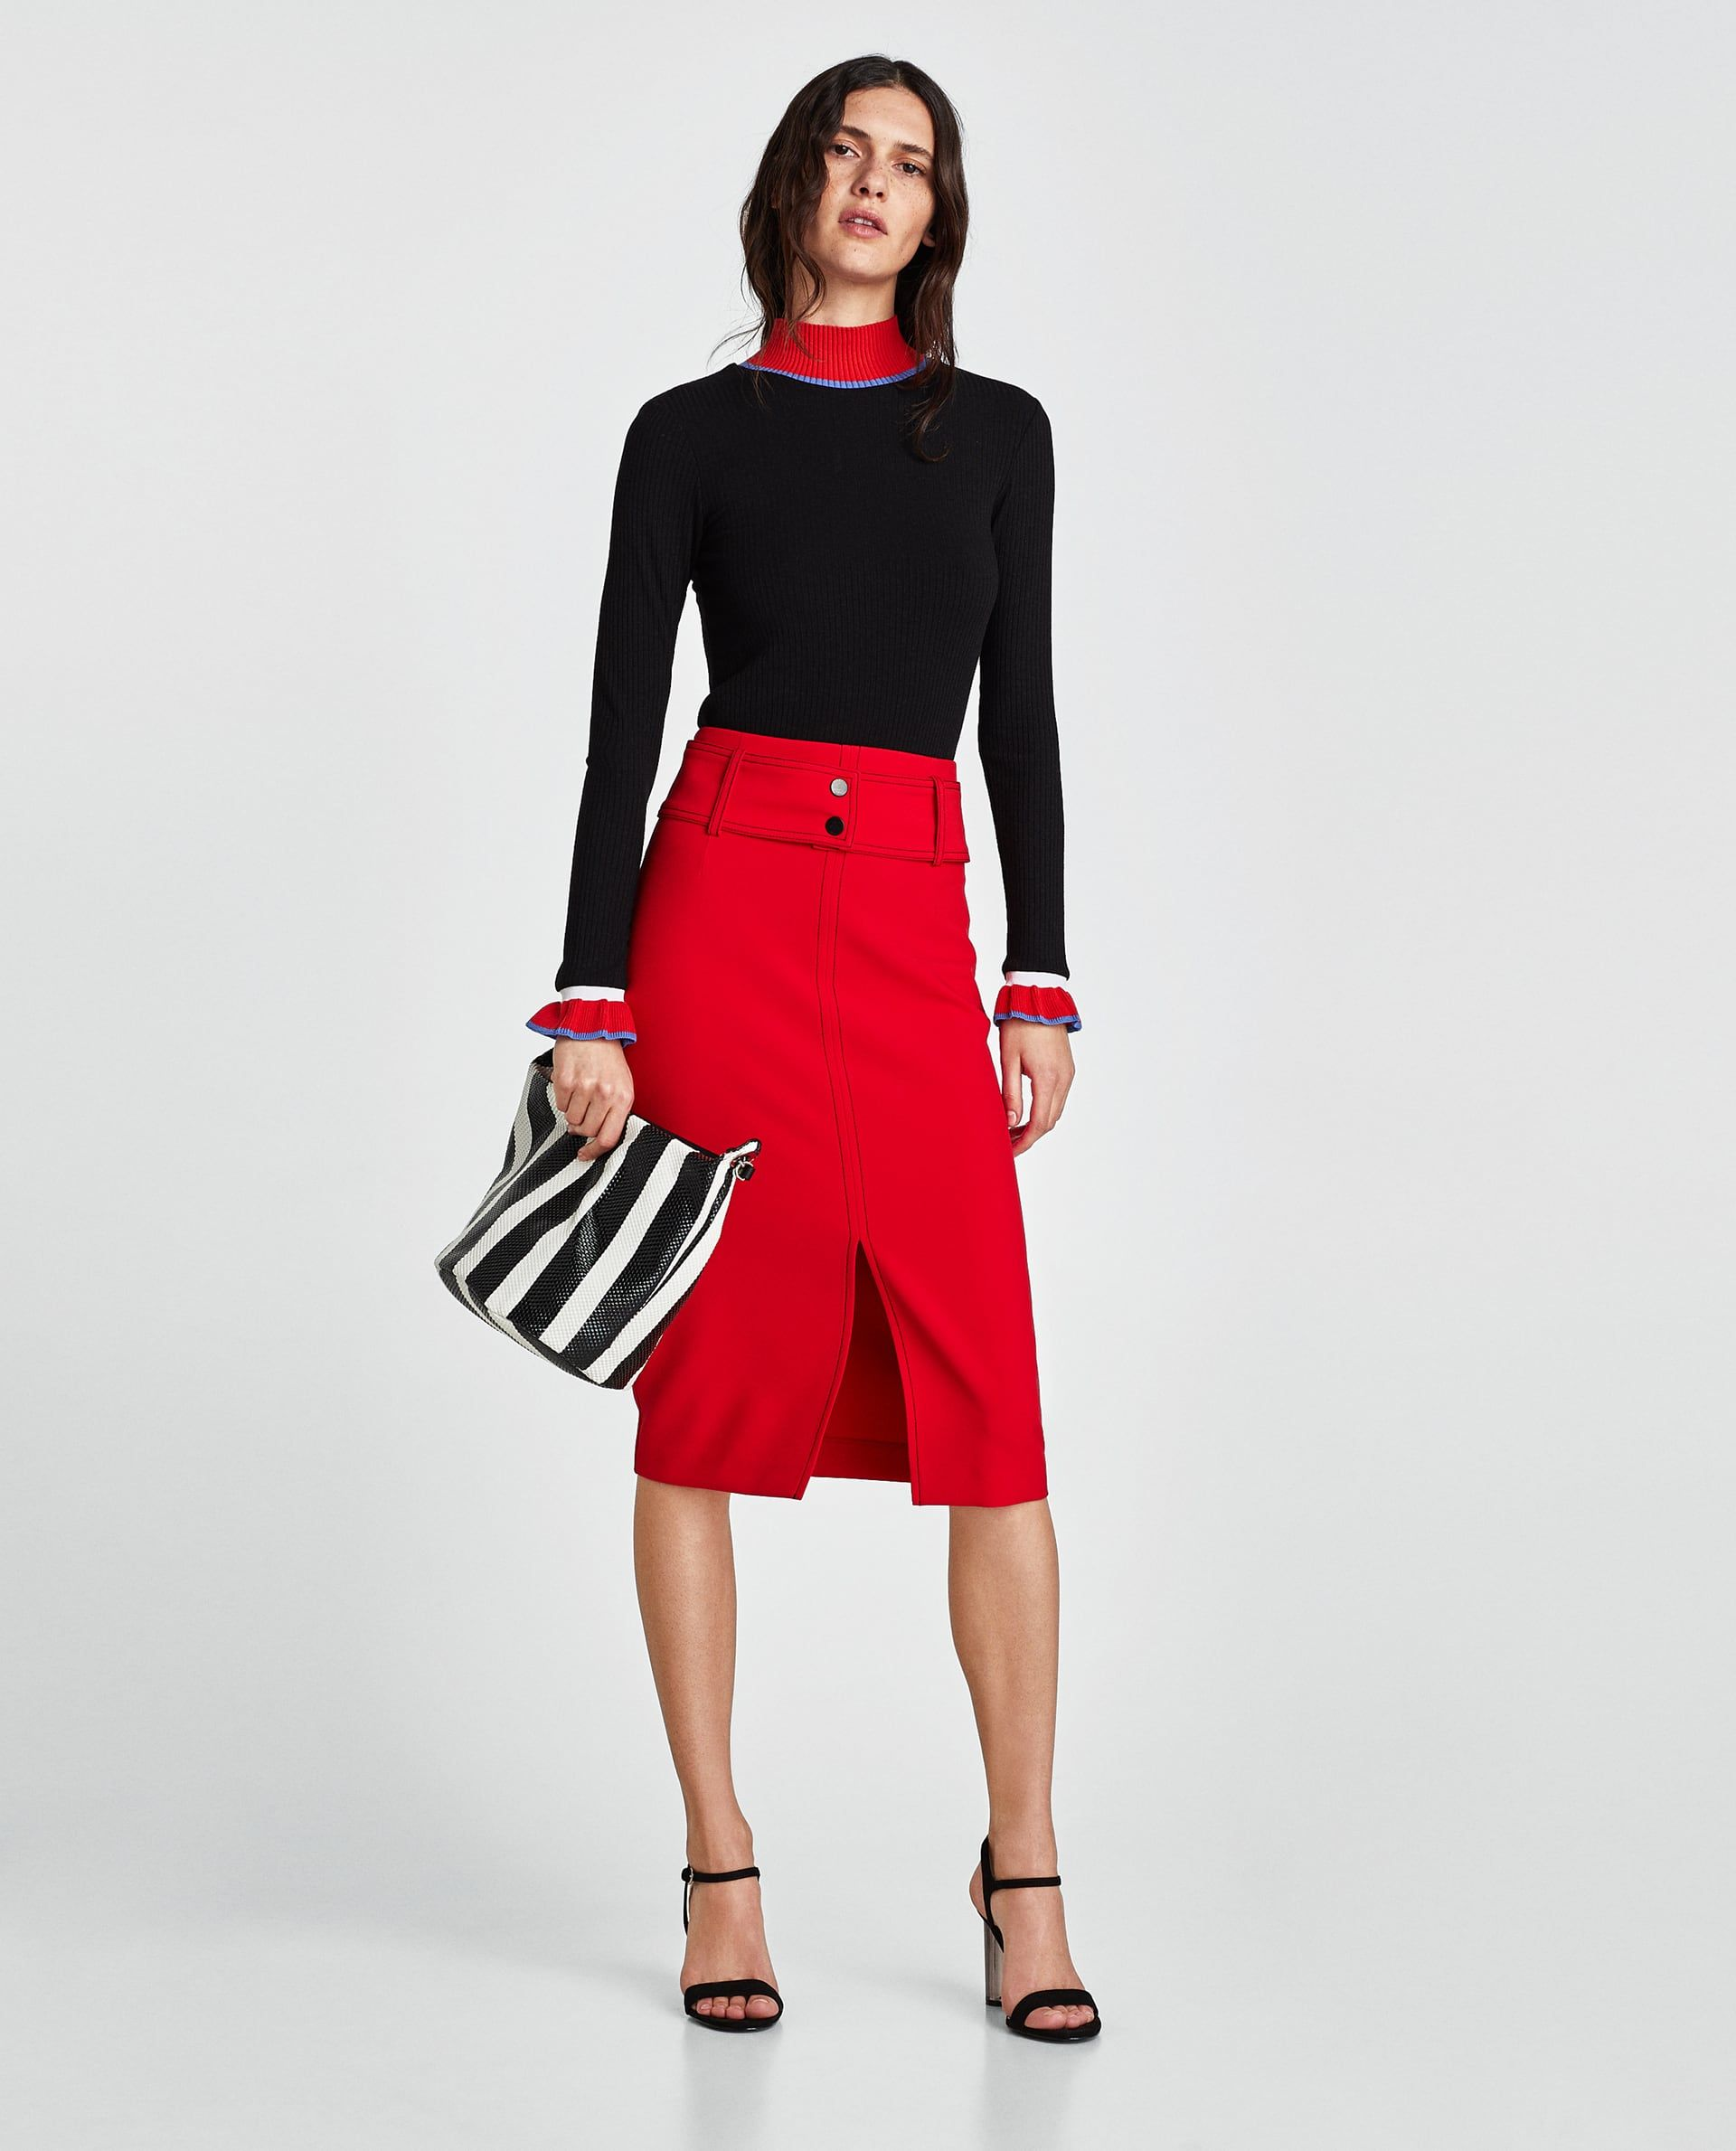 a0d7213f6 FALDA TUBO PESPUNTES | Fashion | Moda femenina, Zara y Blusas de moda